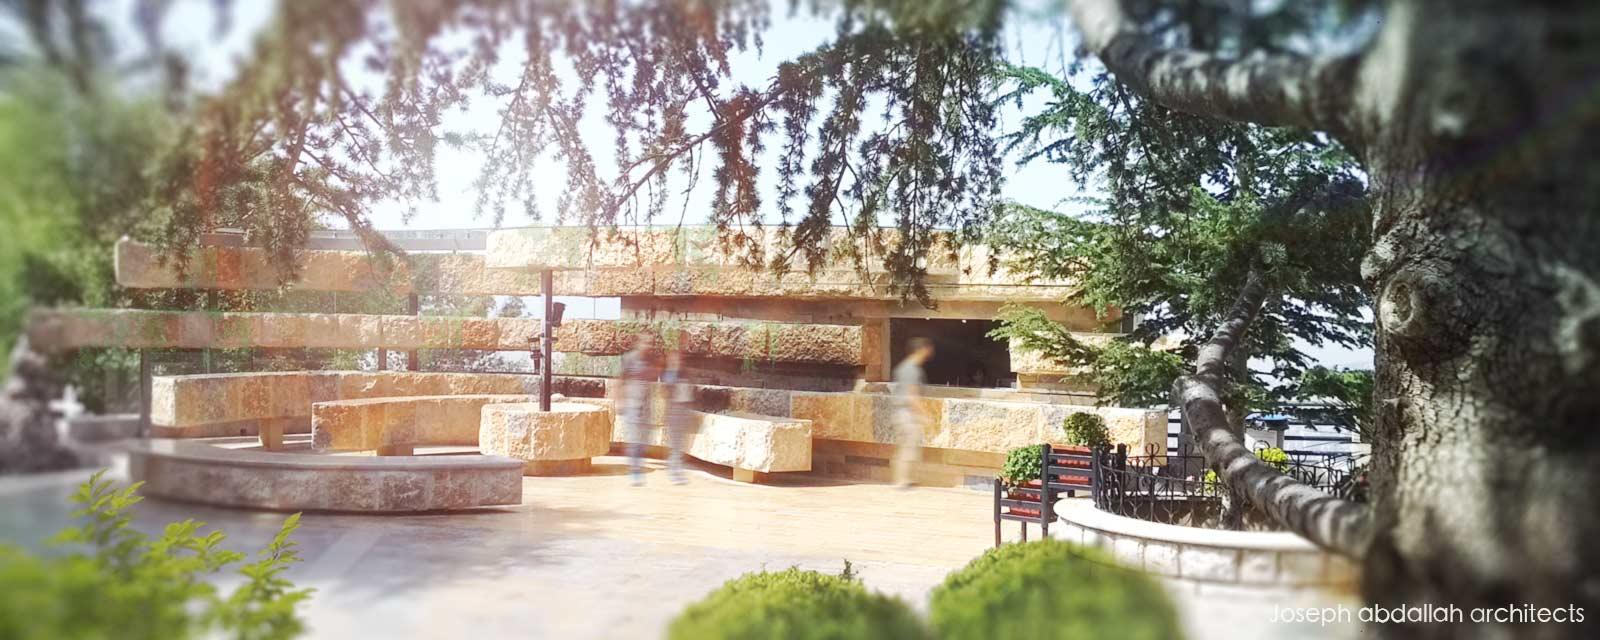 harissa-notre-dame-of-lebanon-shrink-architecture-joseph-abdallah-architects-13